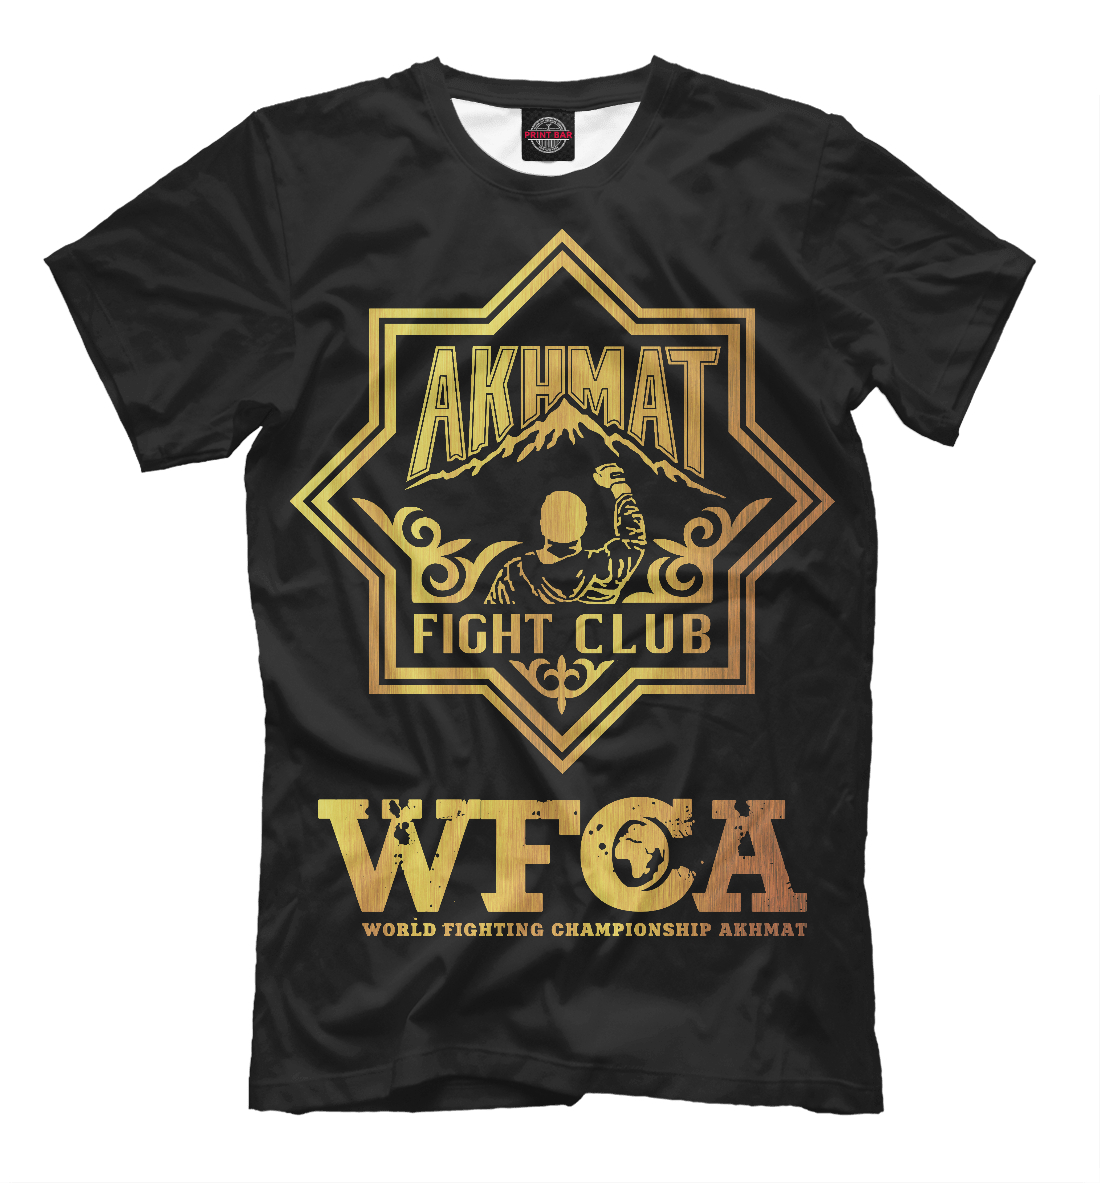 Купить Akhmat Fight Club WFCA, Printbar, Футболки, AFC-810829-fut-2